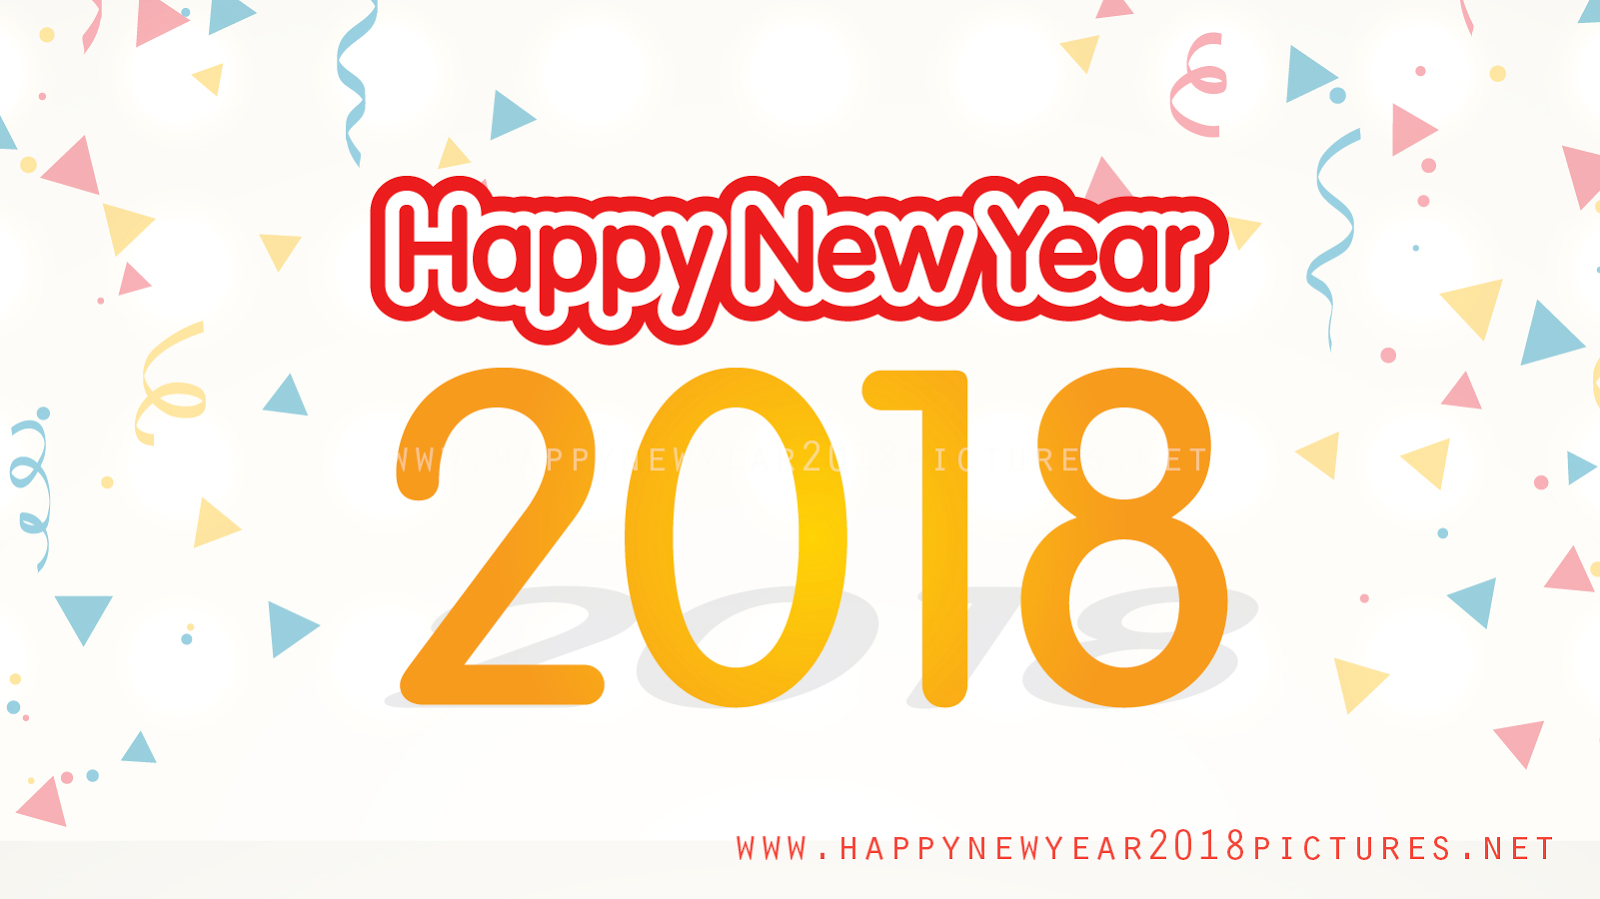 New Year Funny Whatsapp Status Dp 2018 3d Hd Pics Cards